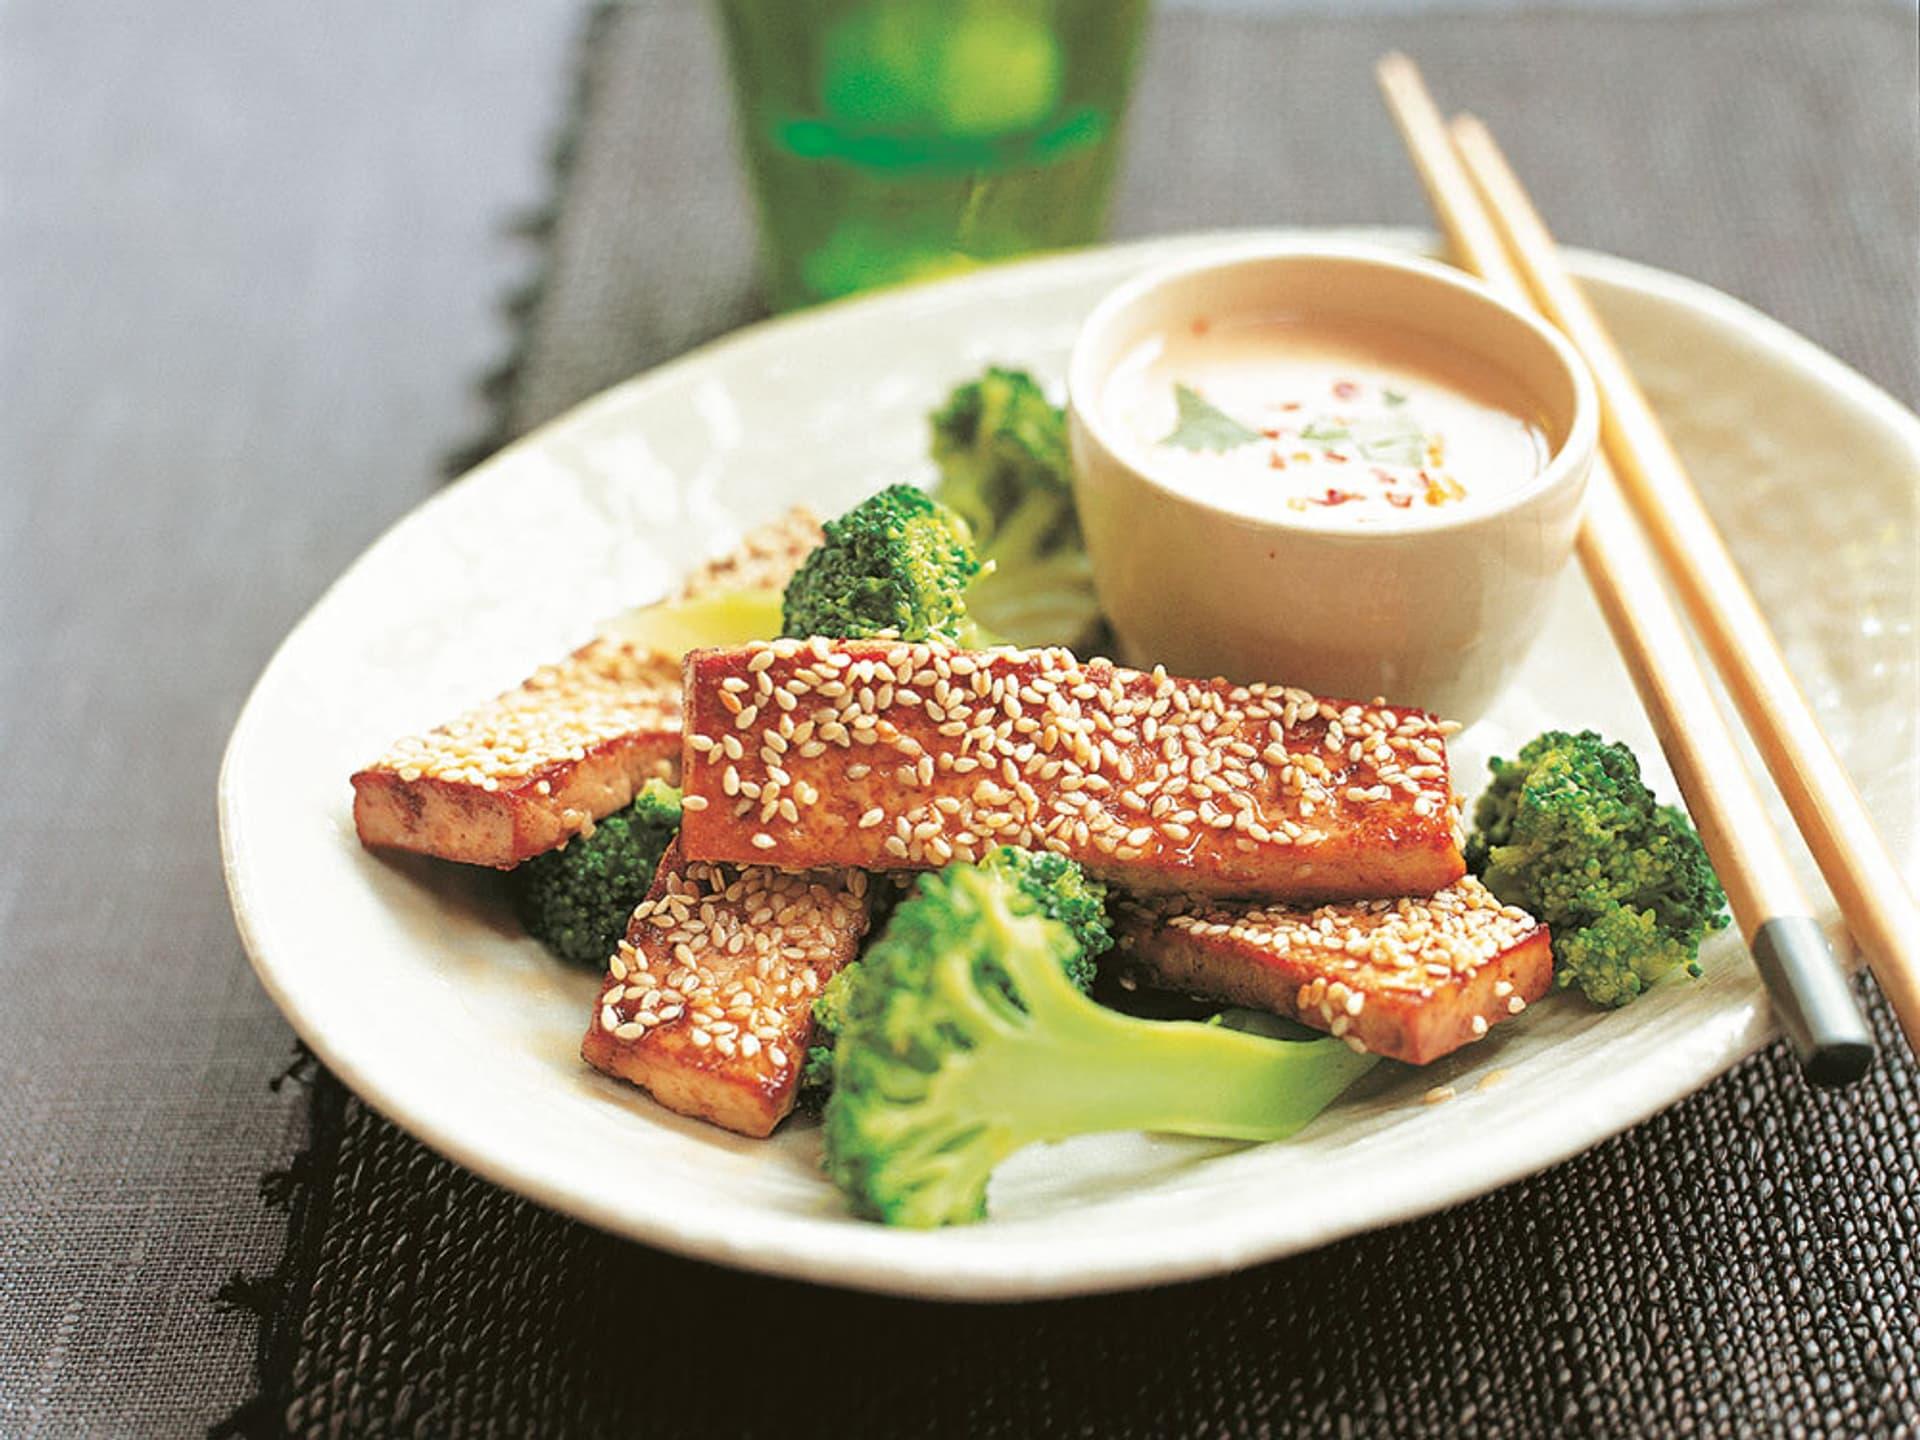 Sesam-Tofu mit Satésoße und Brokkoli